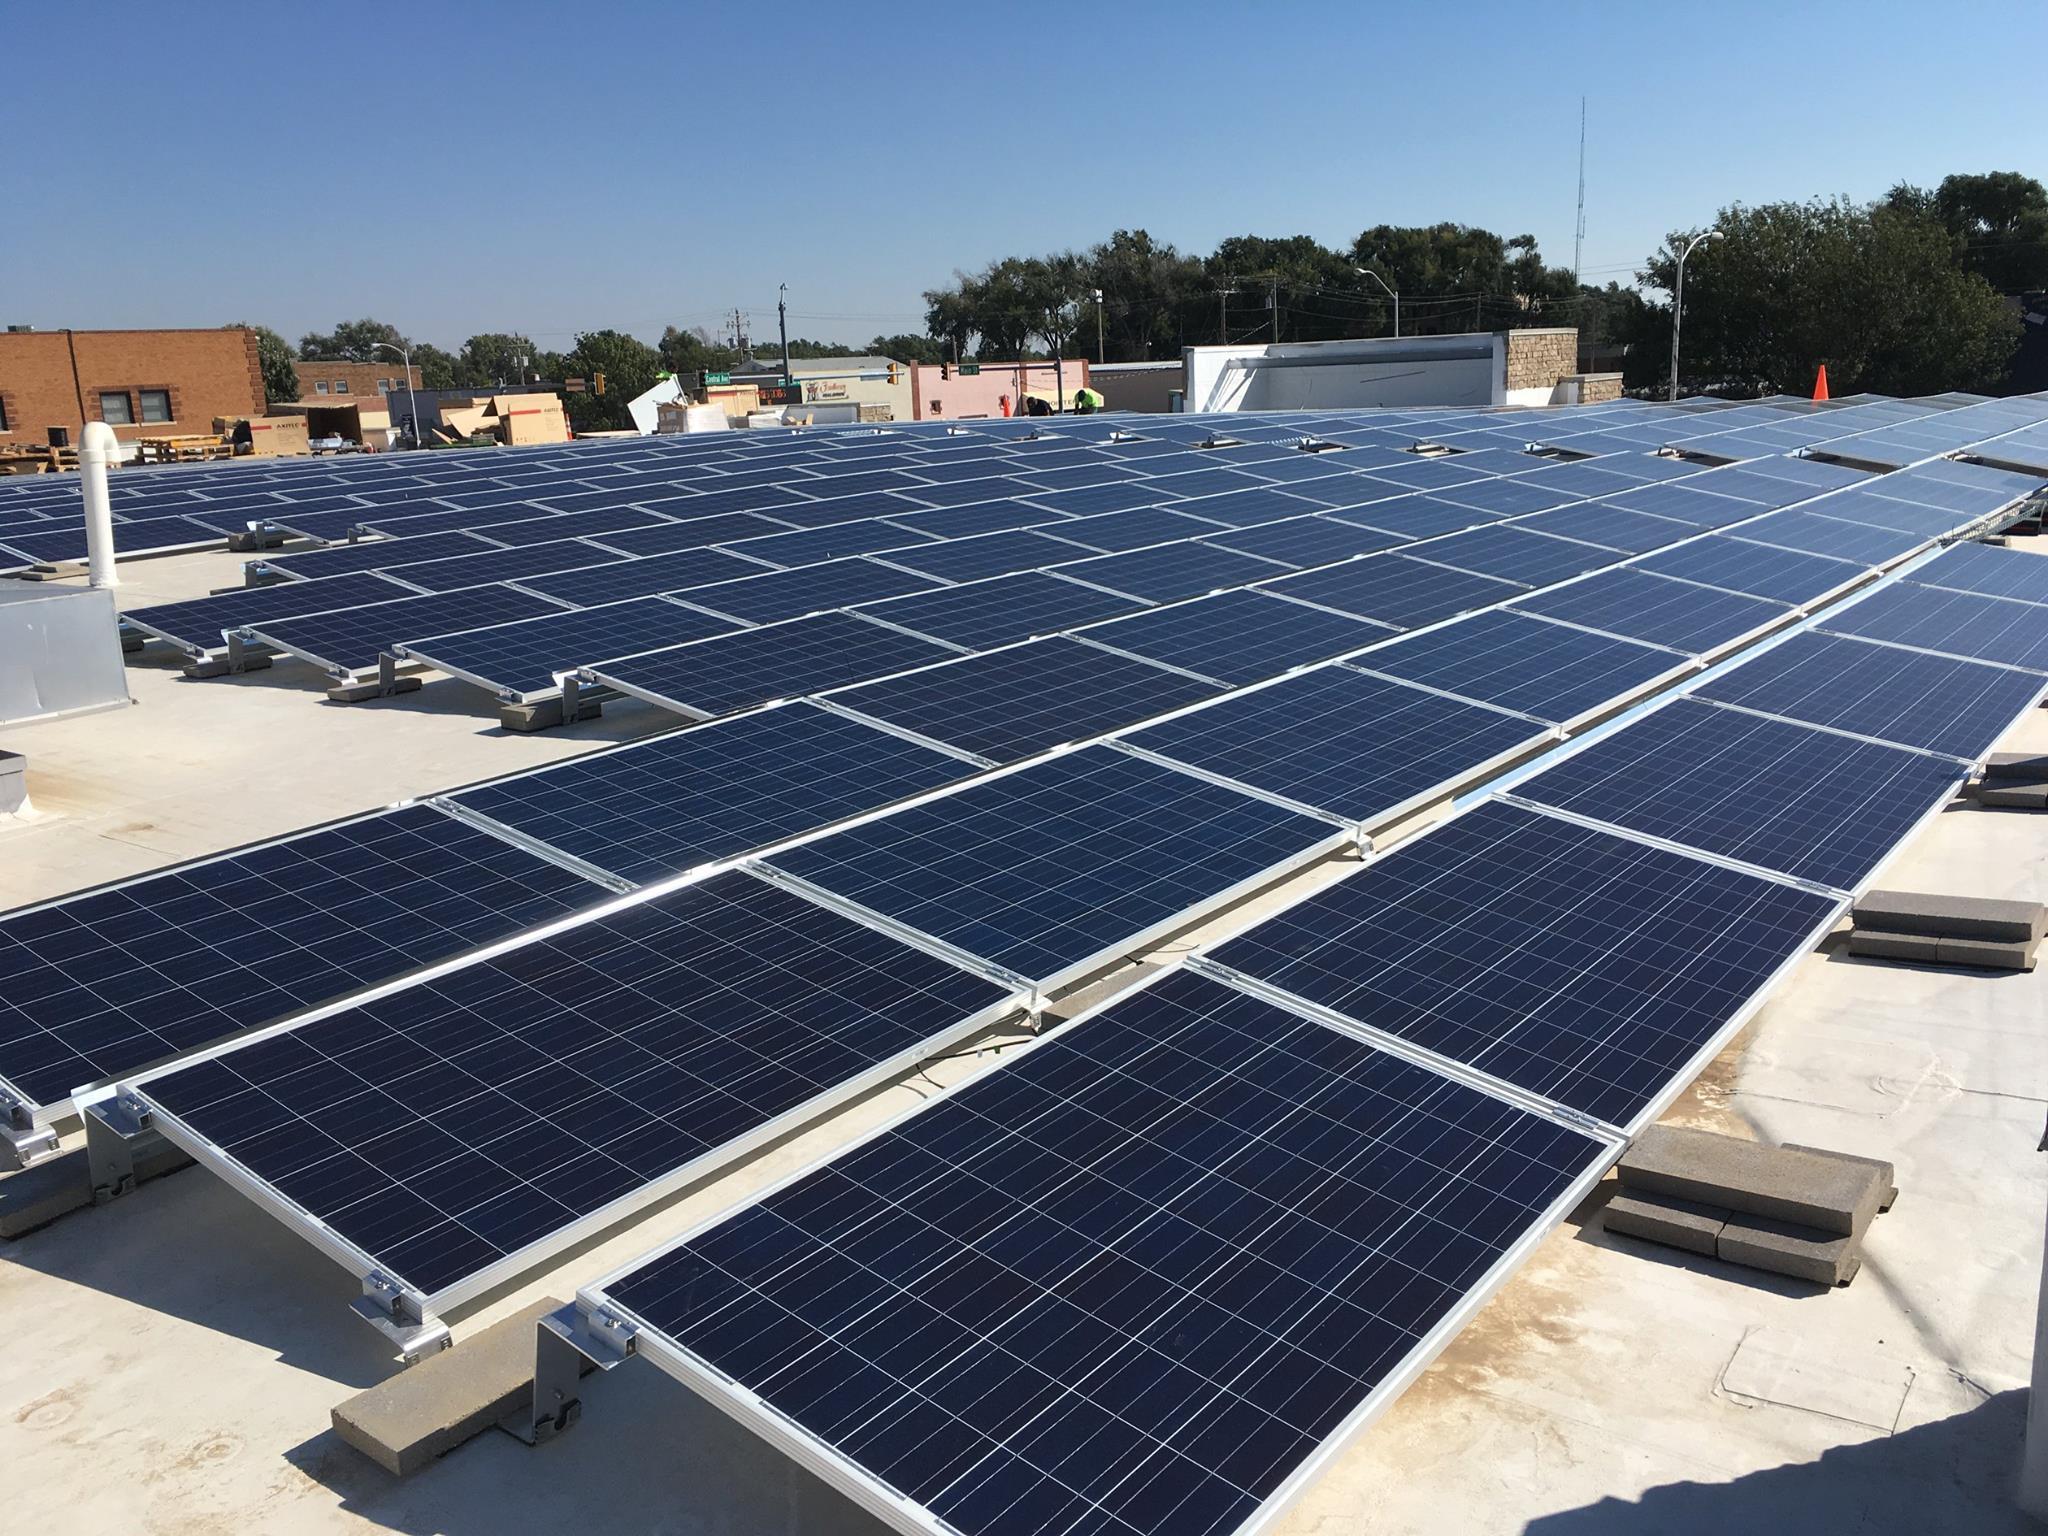 Grant County Solar